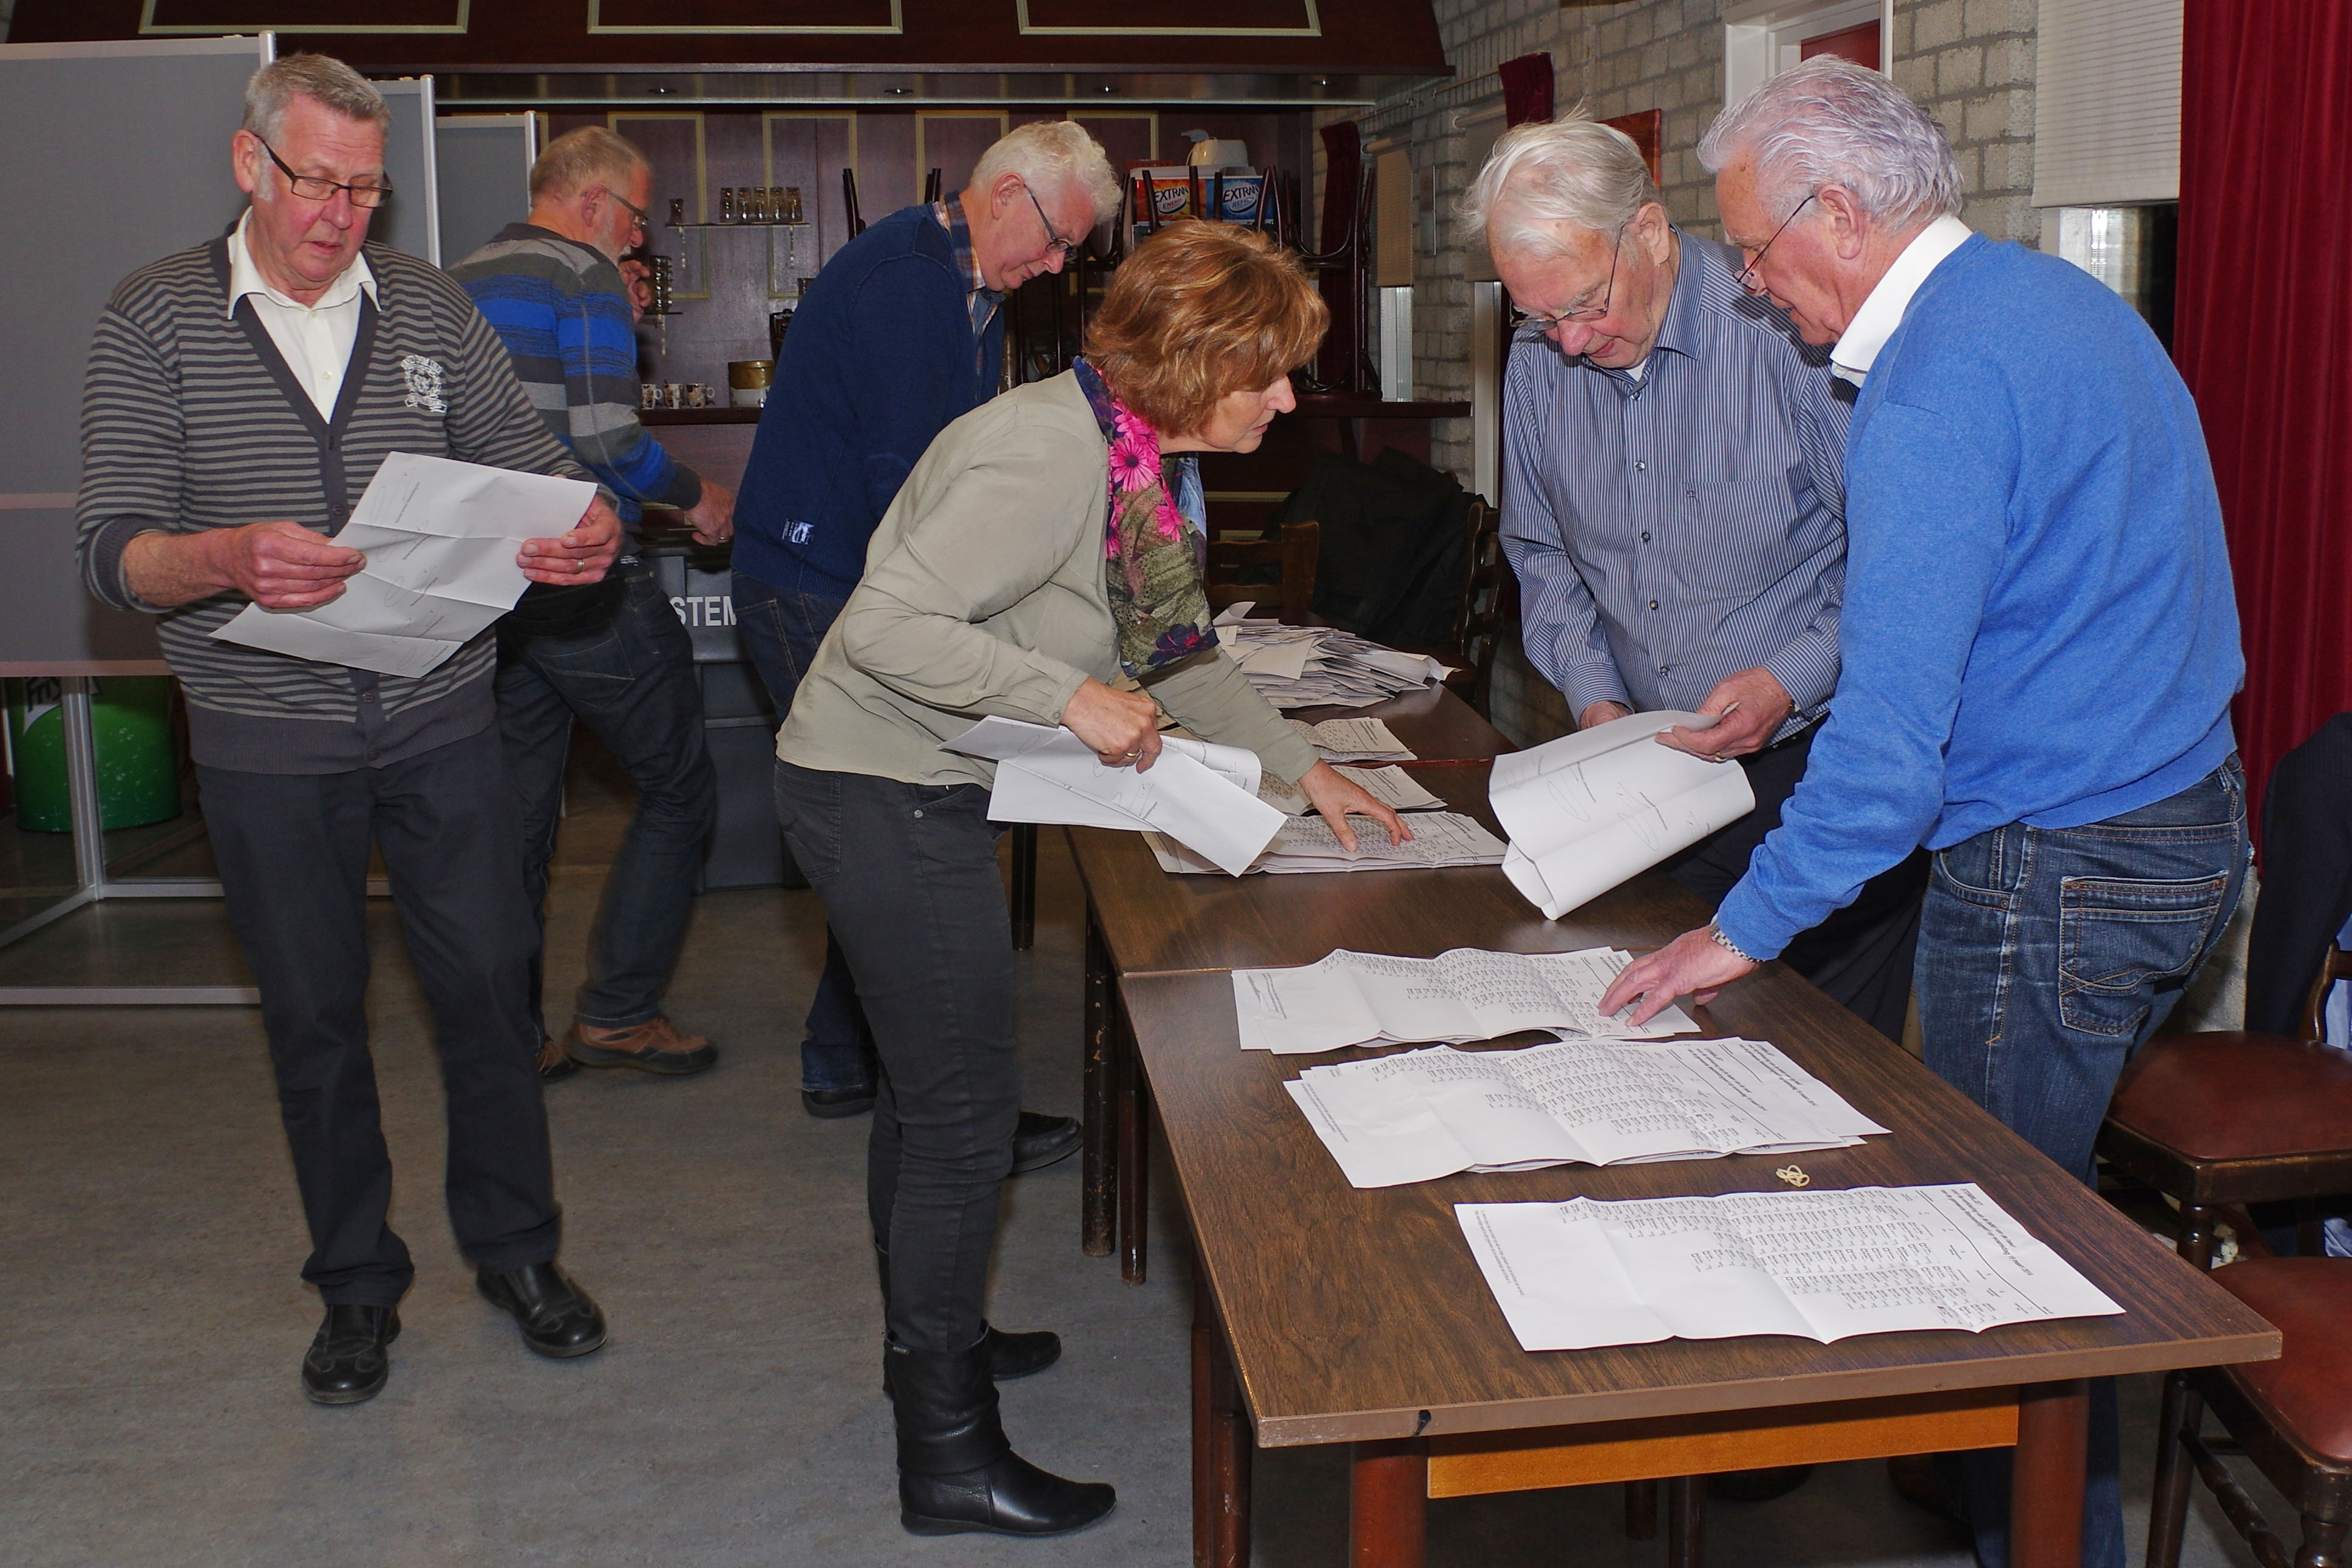 Stemmen gemeenteraad